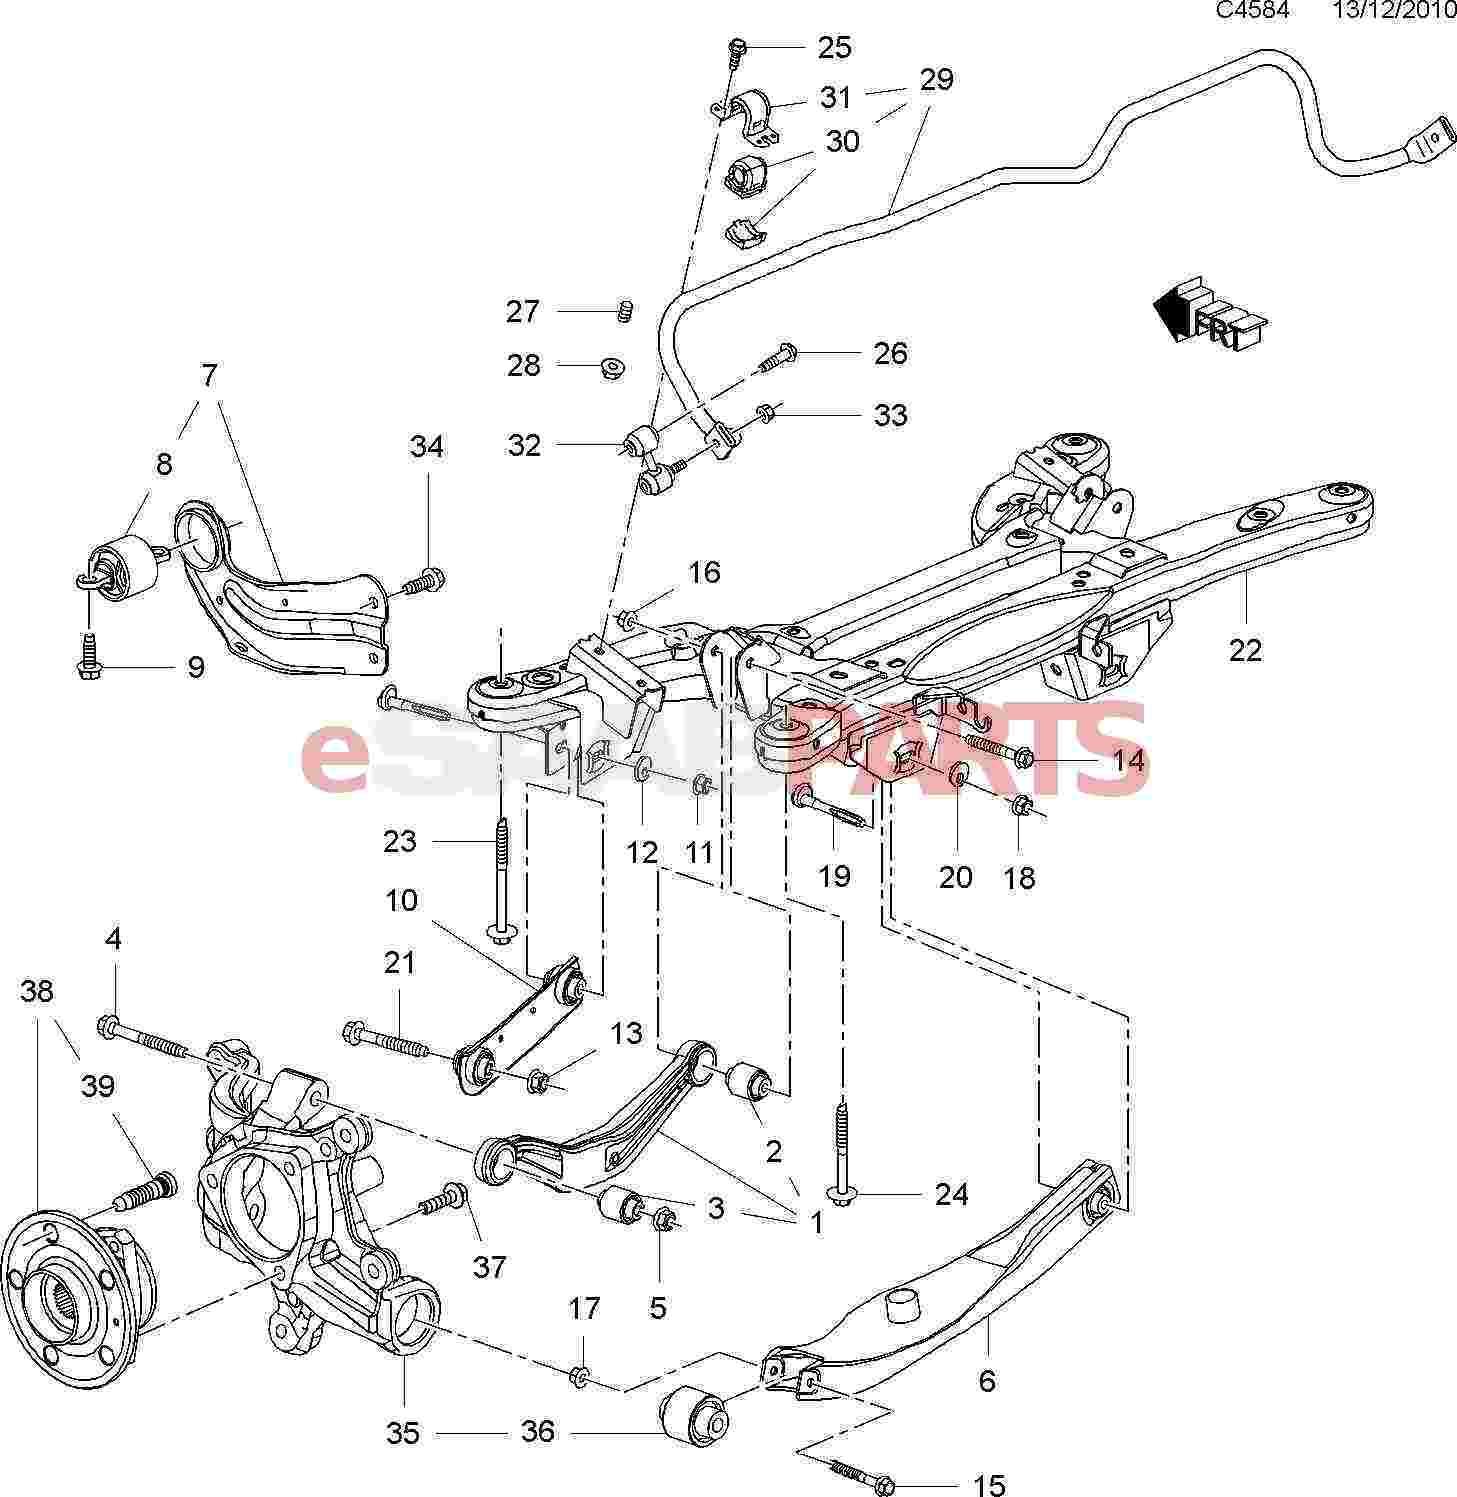 saab 9 5 engine bay diagram